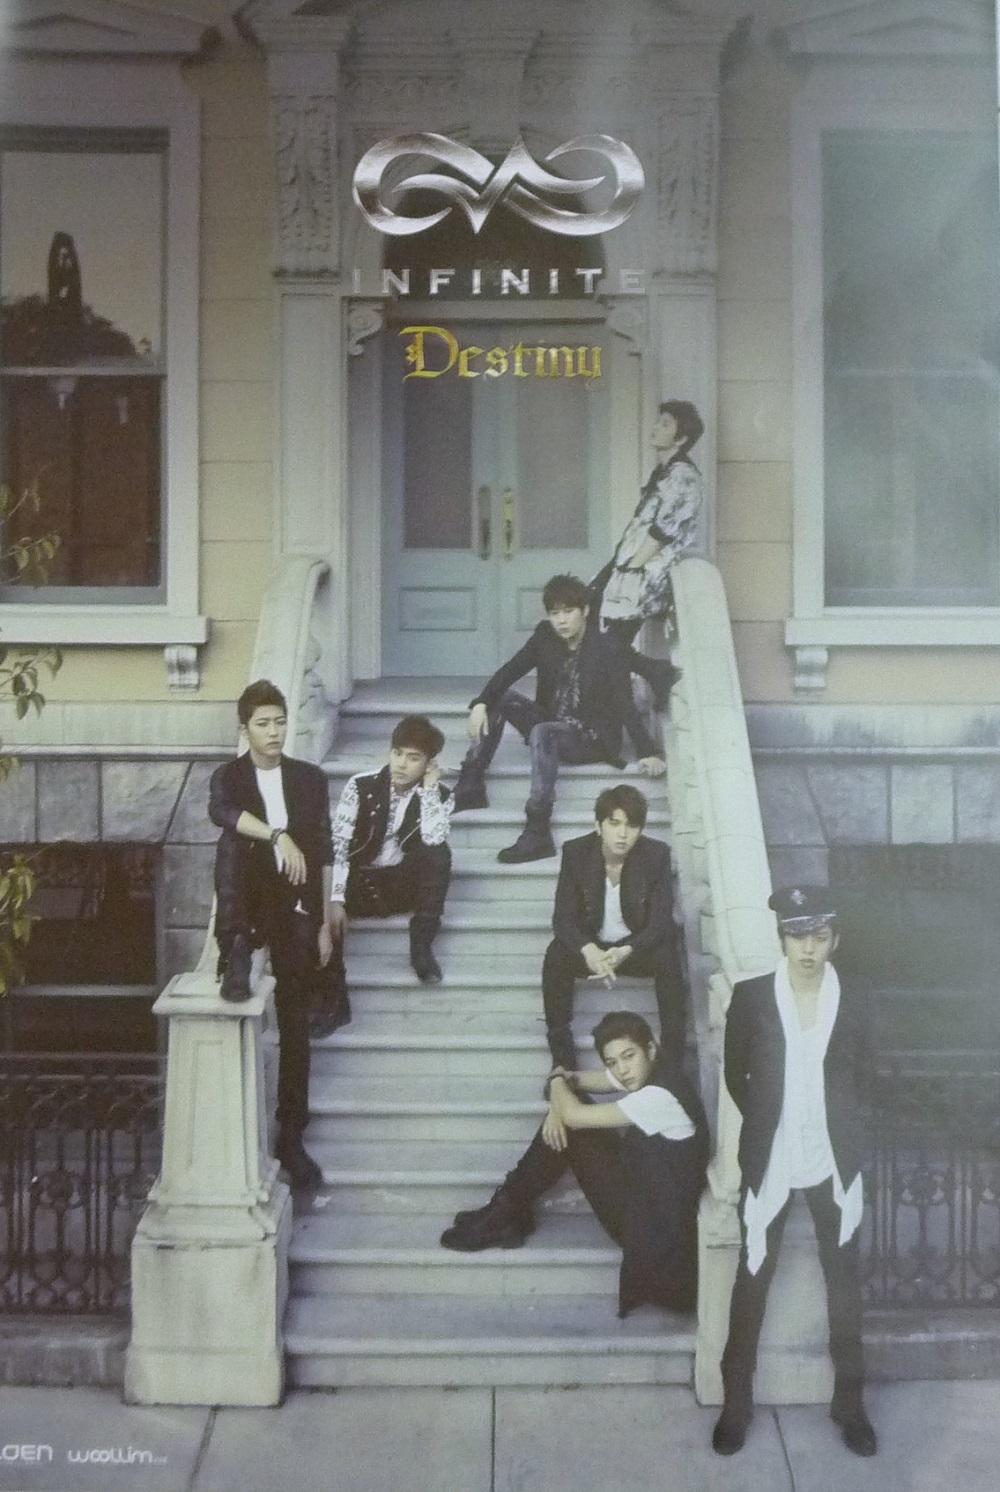 Infinite- Destiny (Stairs)